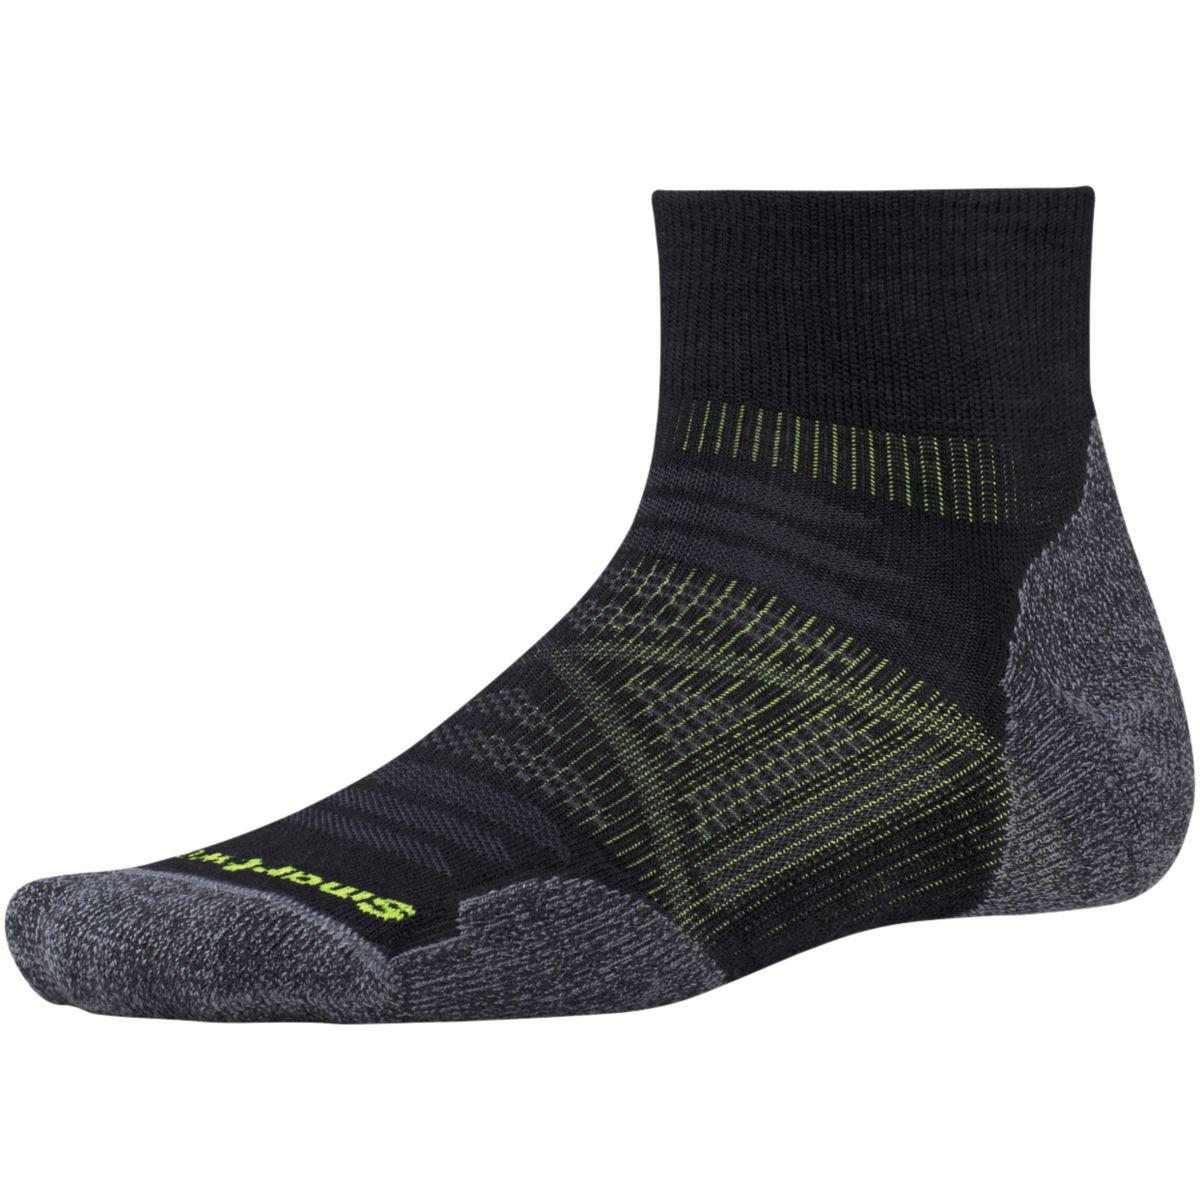 Smartwool Men's Phd Outdoor Light Mini Socks - Black, M